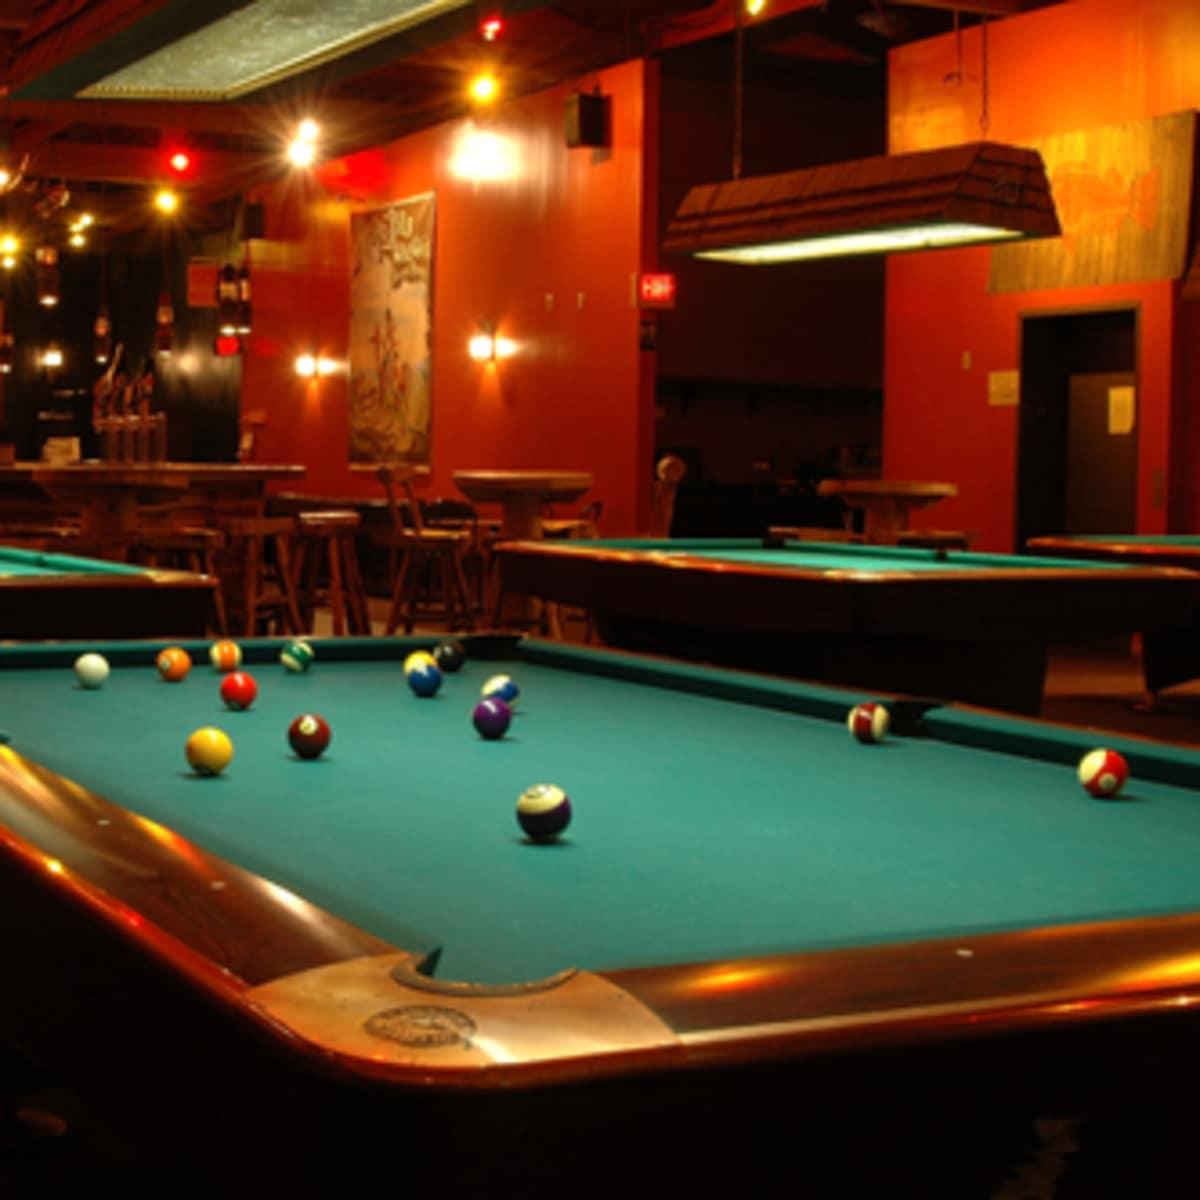 Austin_photo: places_drinks_buffalo billiards_pool